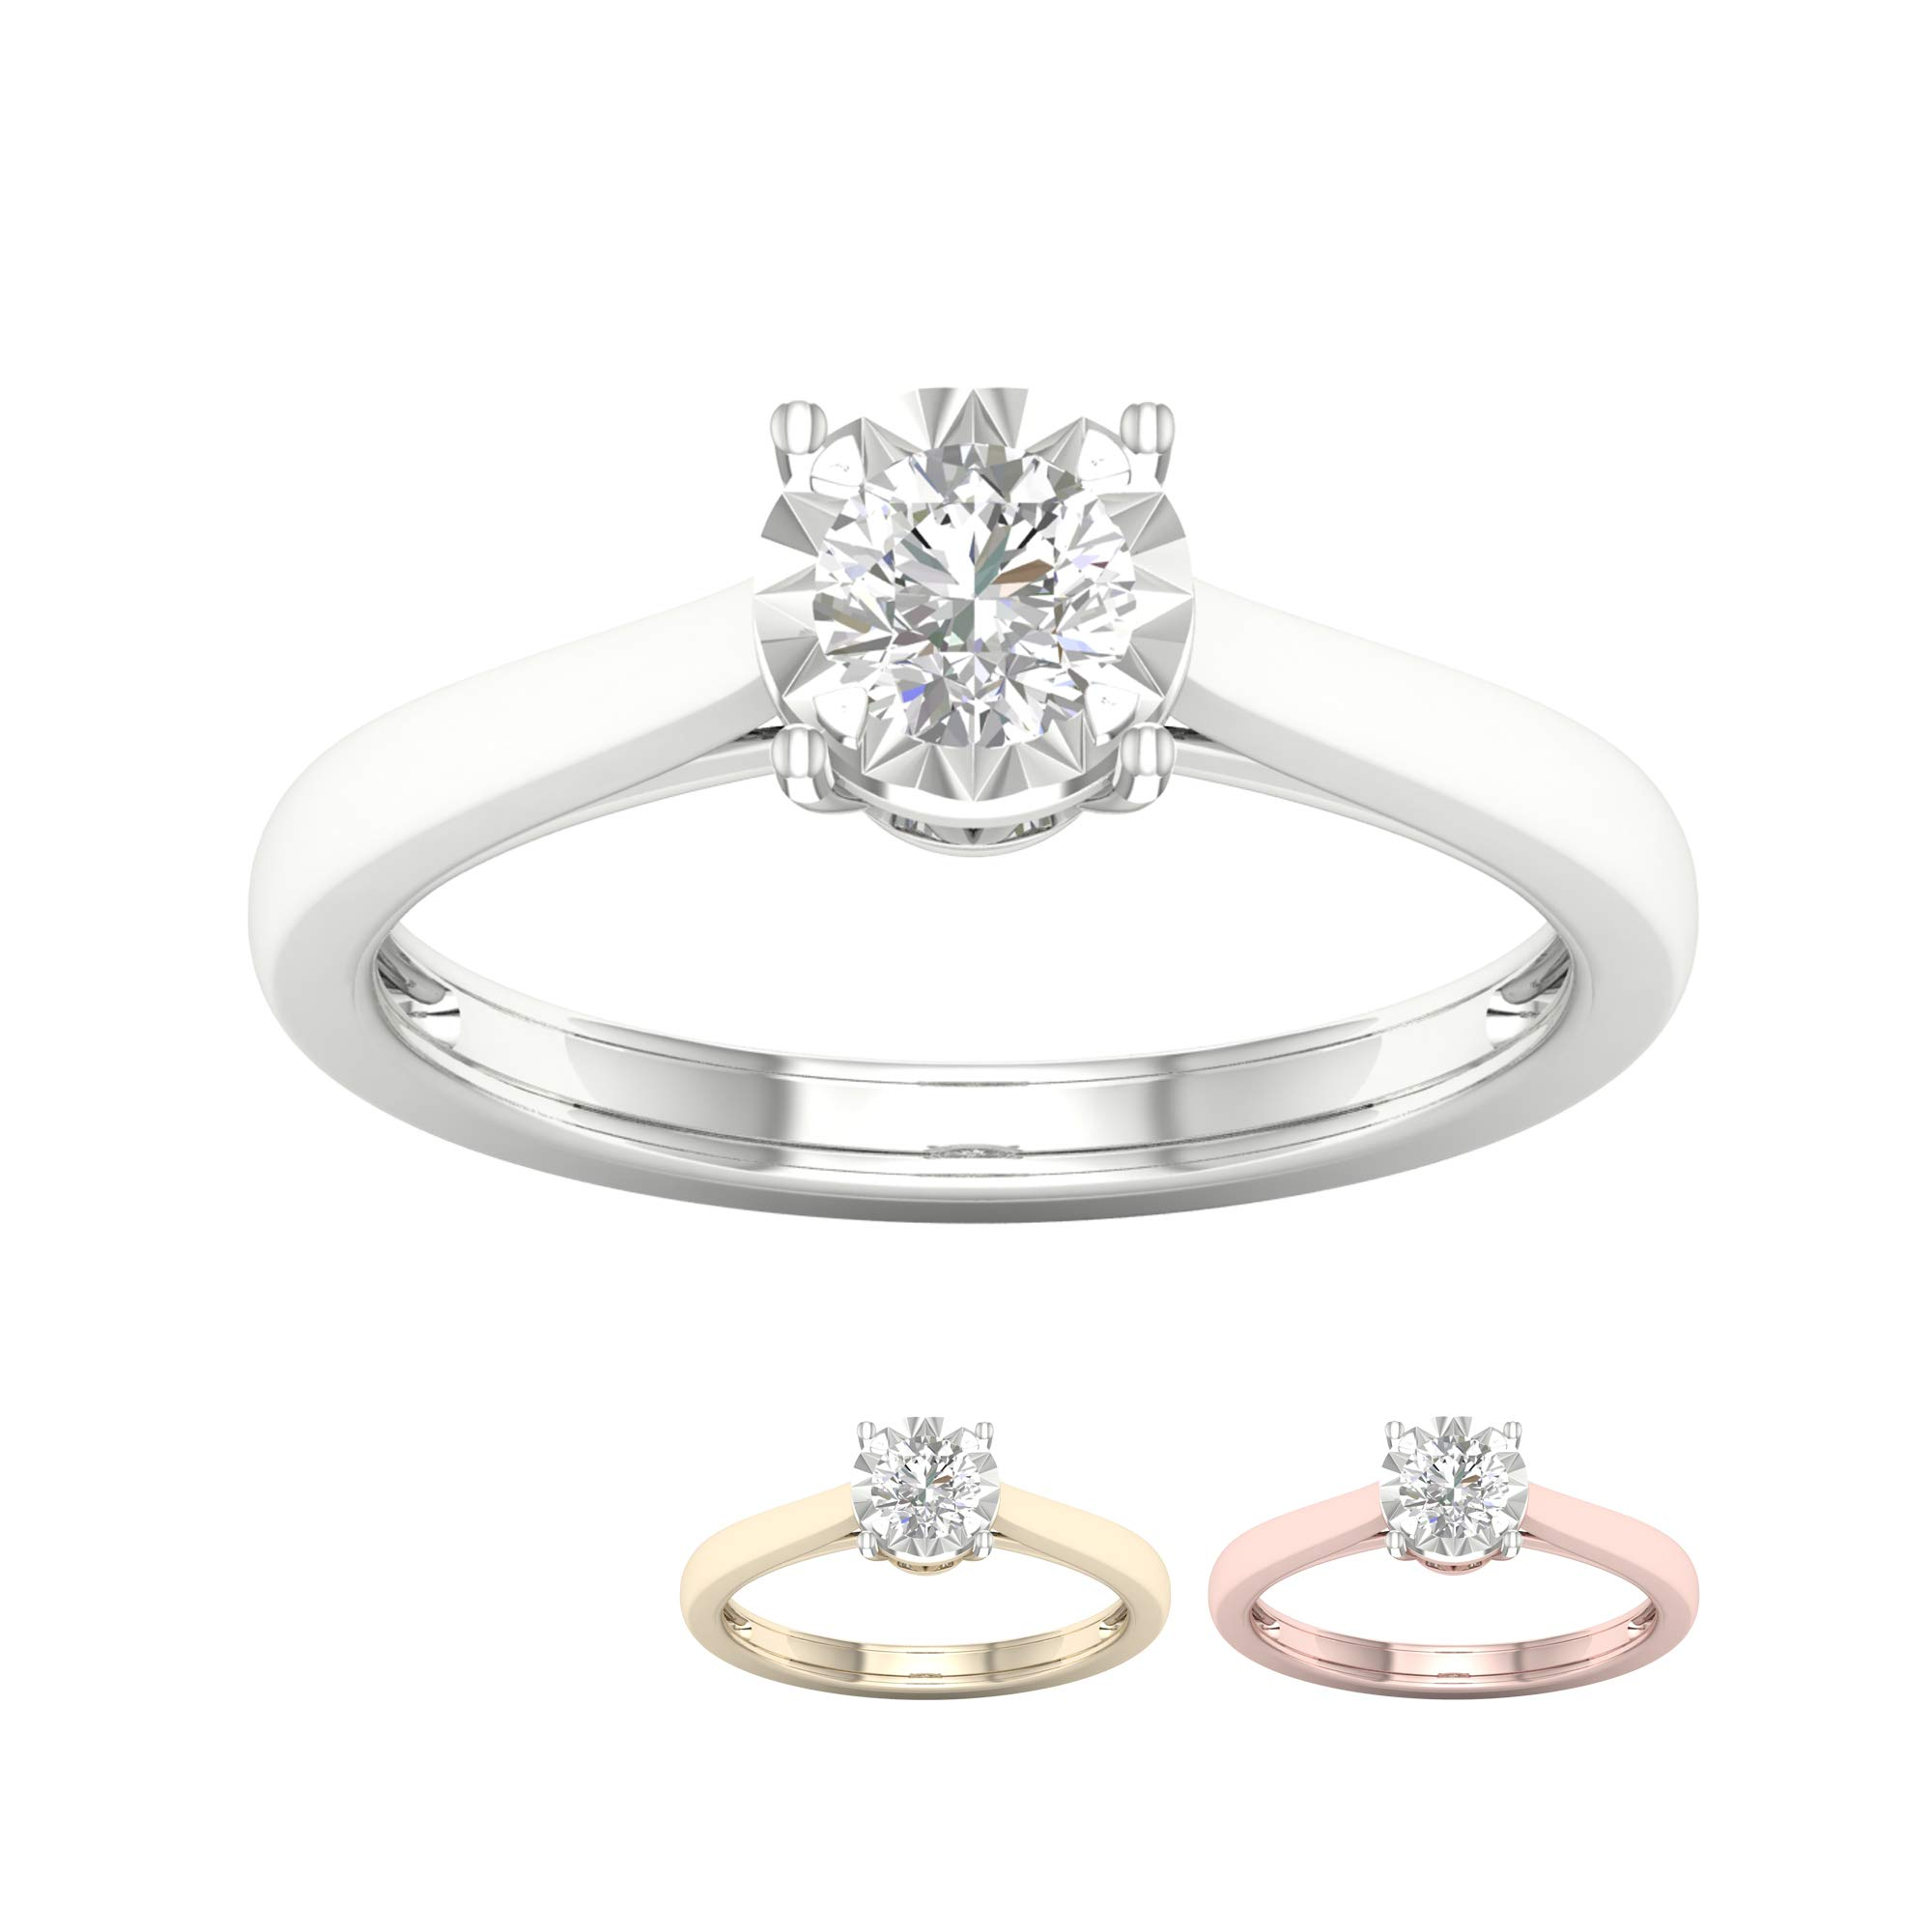 IGI Certified 10k Yellow Gold 1/4Ct TDW Round Diamond Solitaire Engagement Ring (I-J,I2)